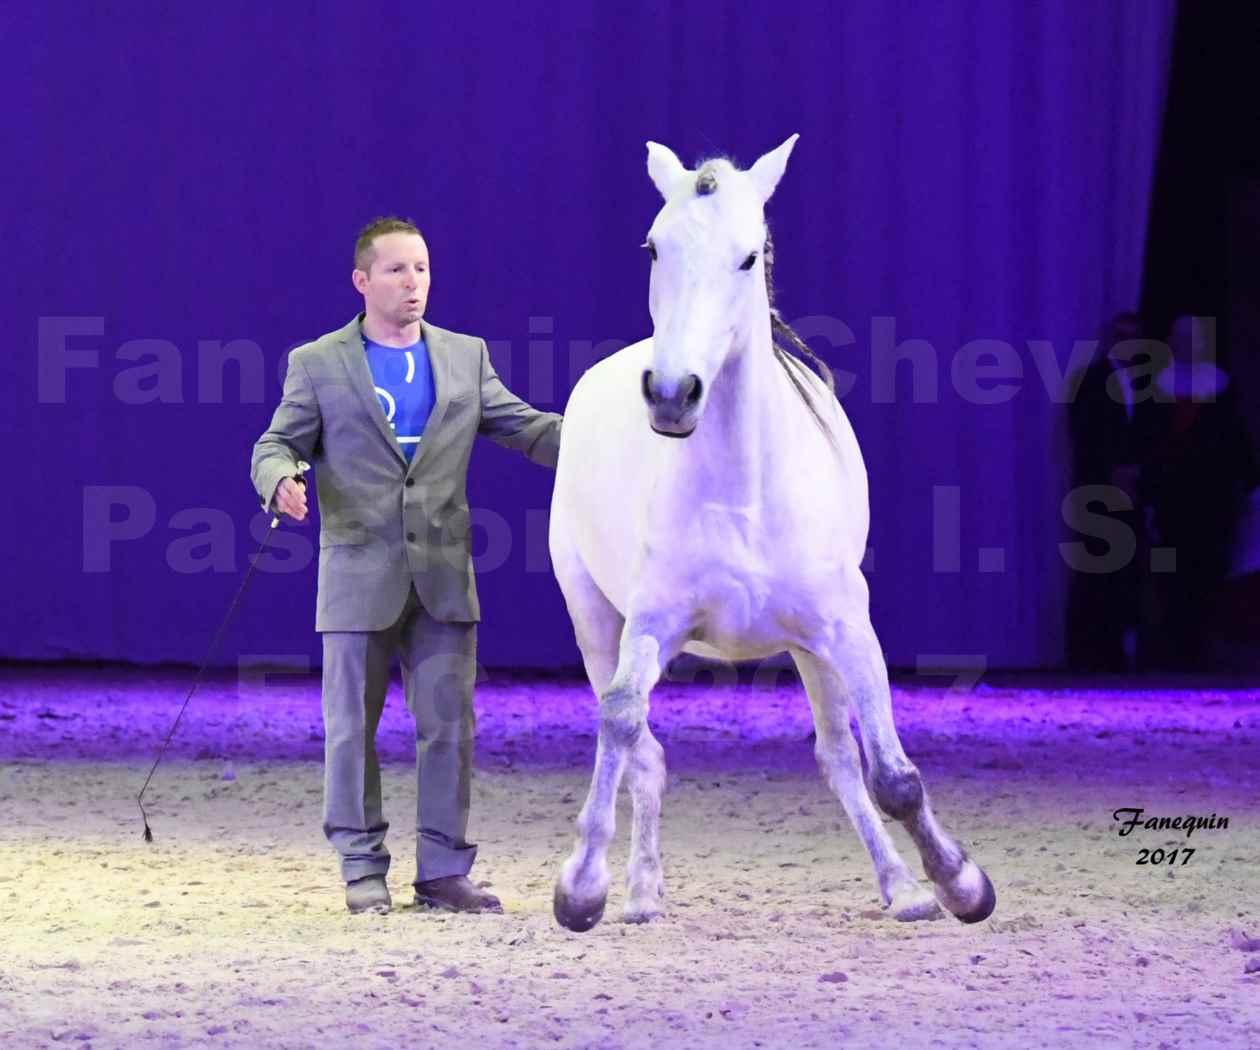 Cheval Passion 2017 - M. I. S. E. C. - Ludovic LONGO & 1 cheval en liberté - 05